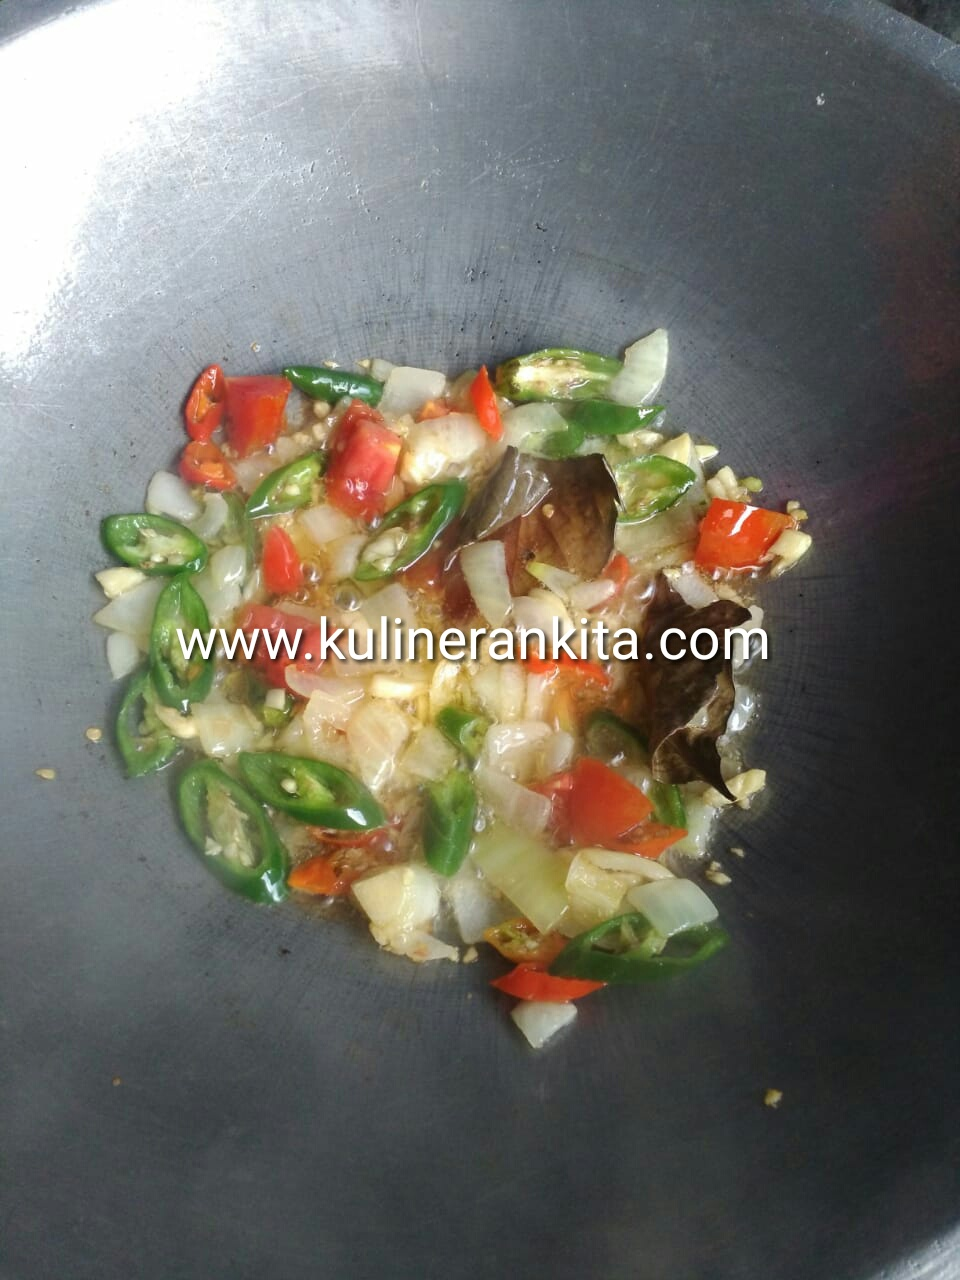 Resep Daging Se'i Sapi Saos Lada Hitam Kota Kupang